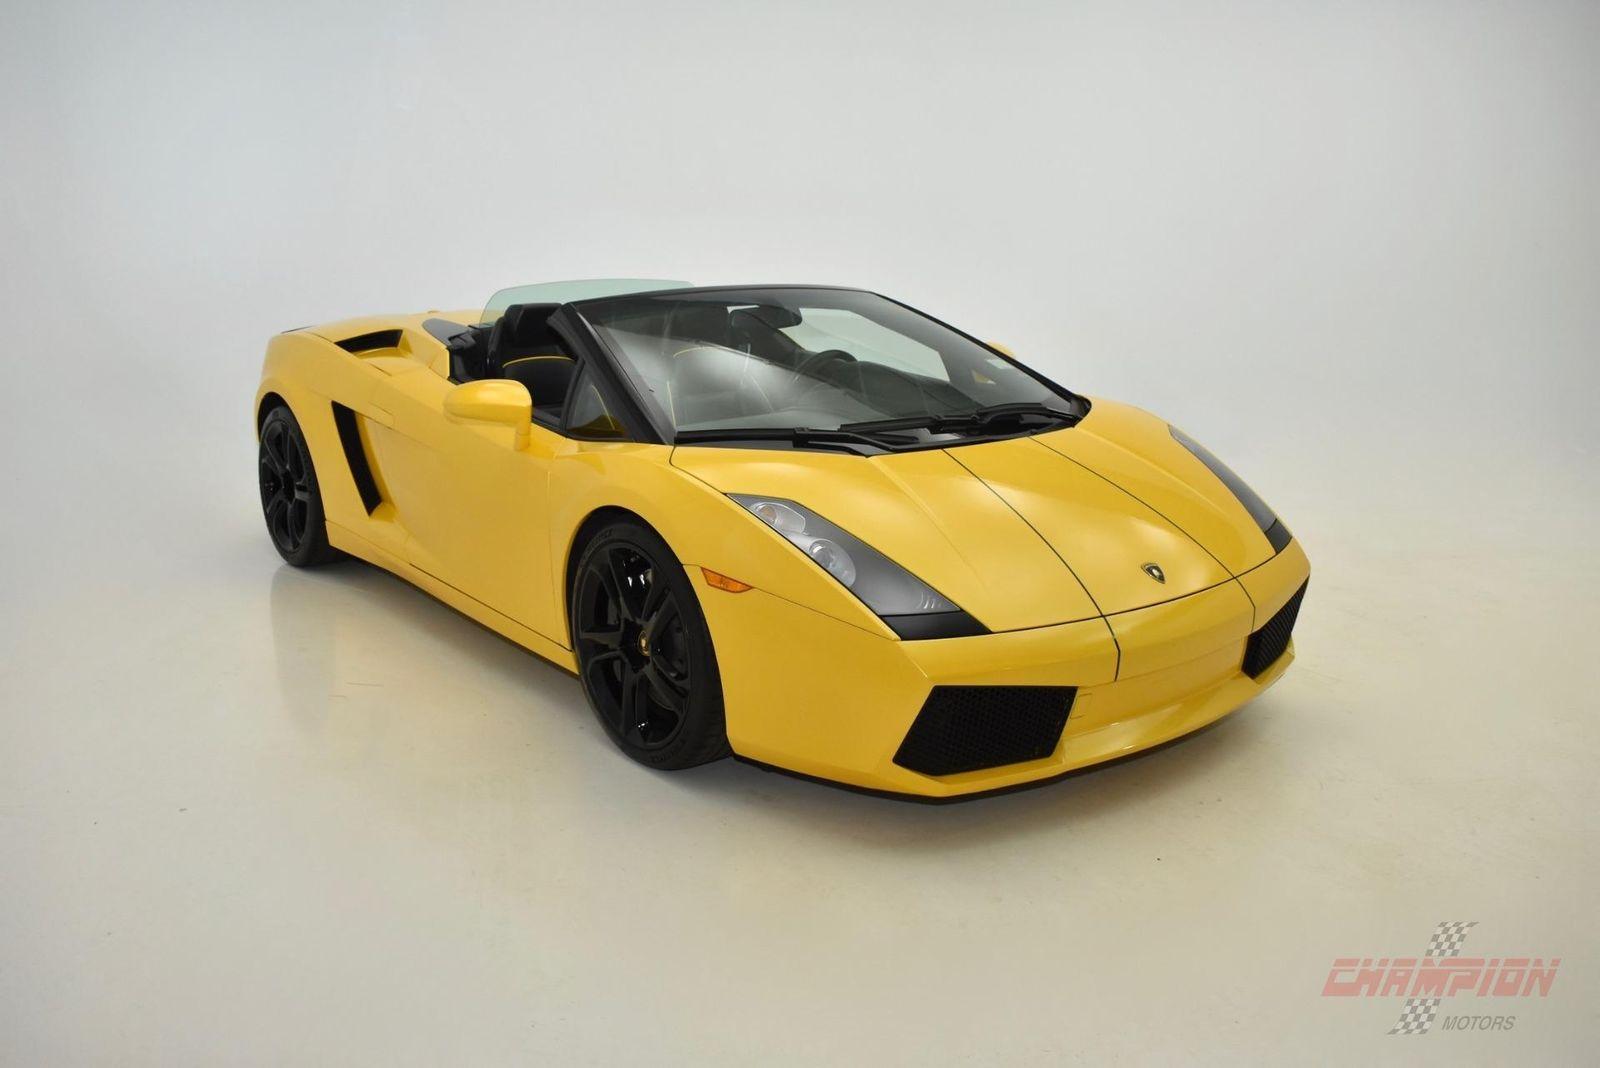 Amazing Gallardo Spyder 2006 Lamborghini Gallardo Spyder 26233 Miles